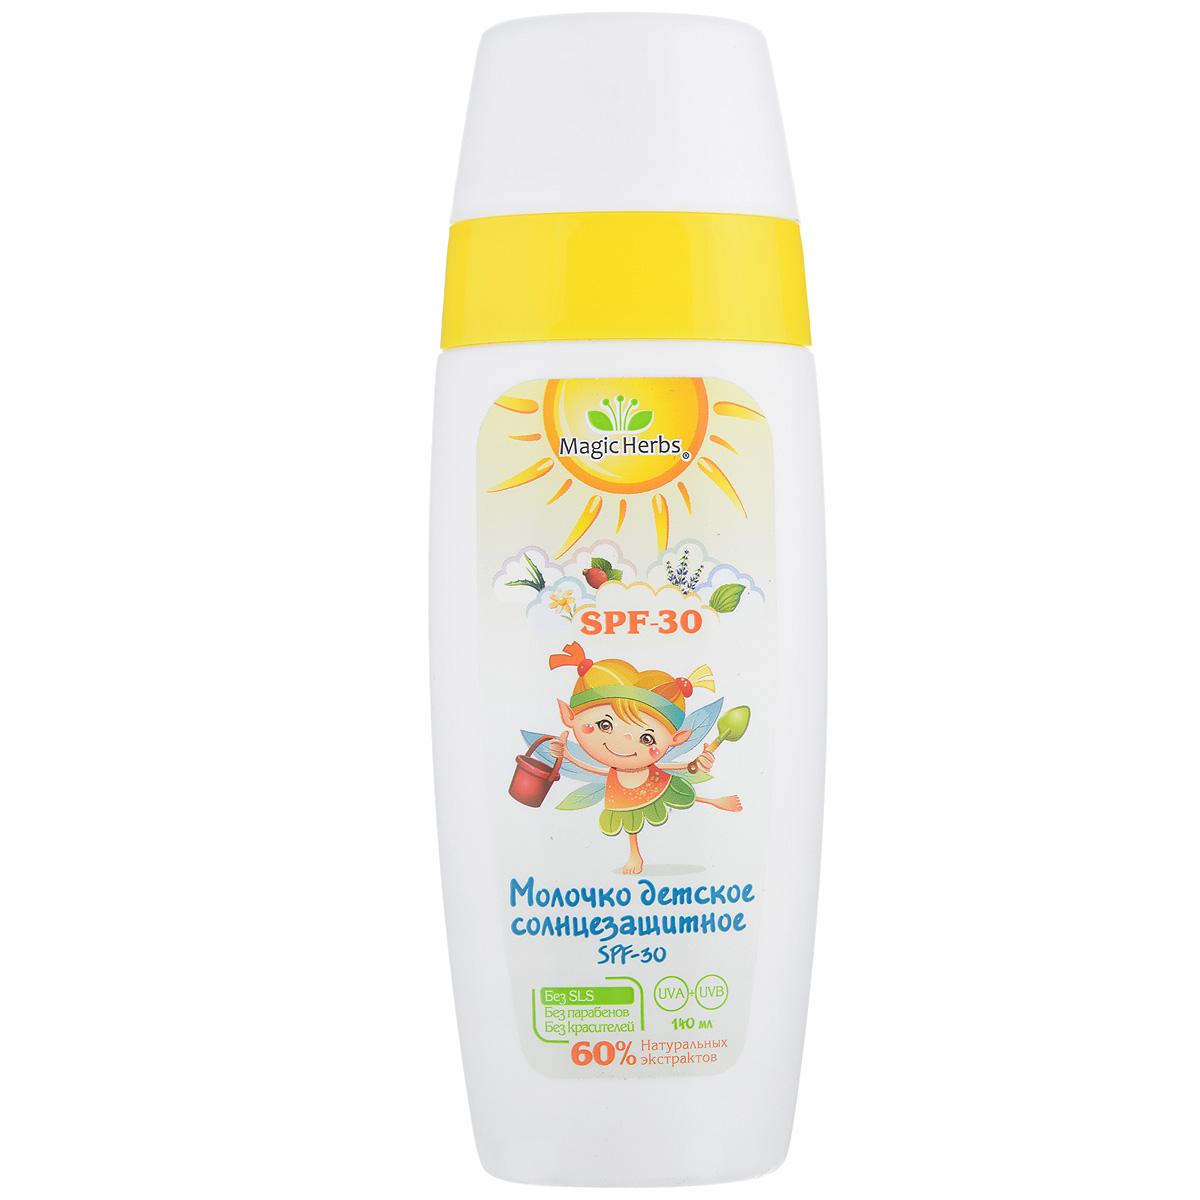 Magic Herbs Молочко детское солнцезащитное, SPF-30, 140 мл БП225